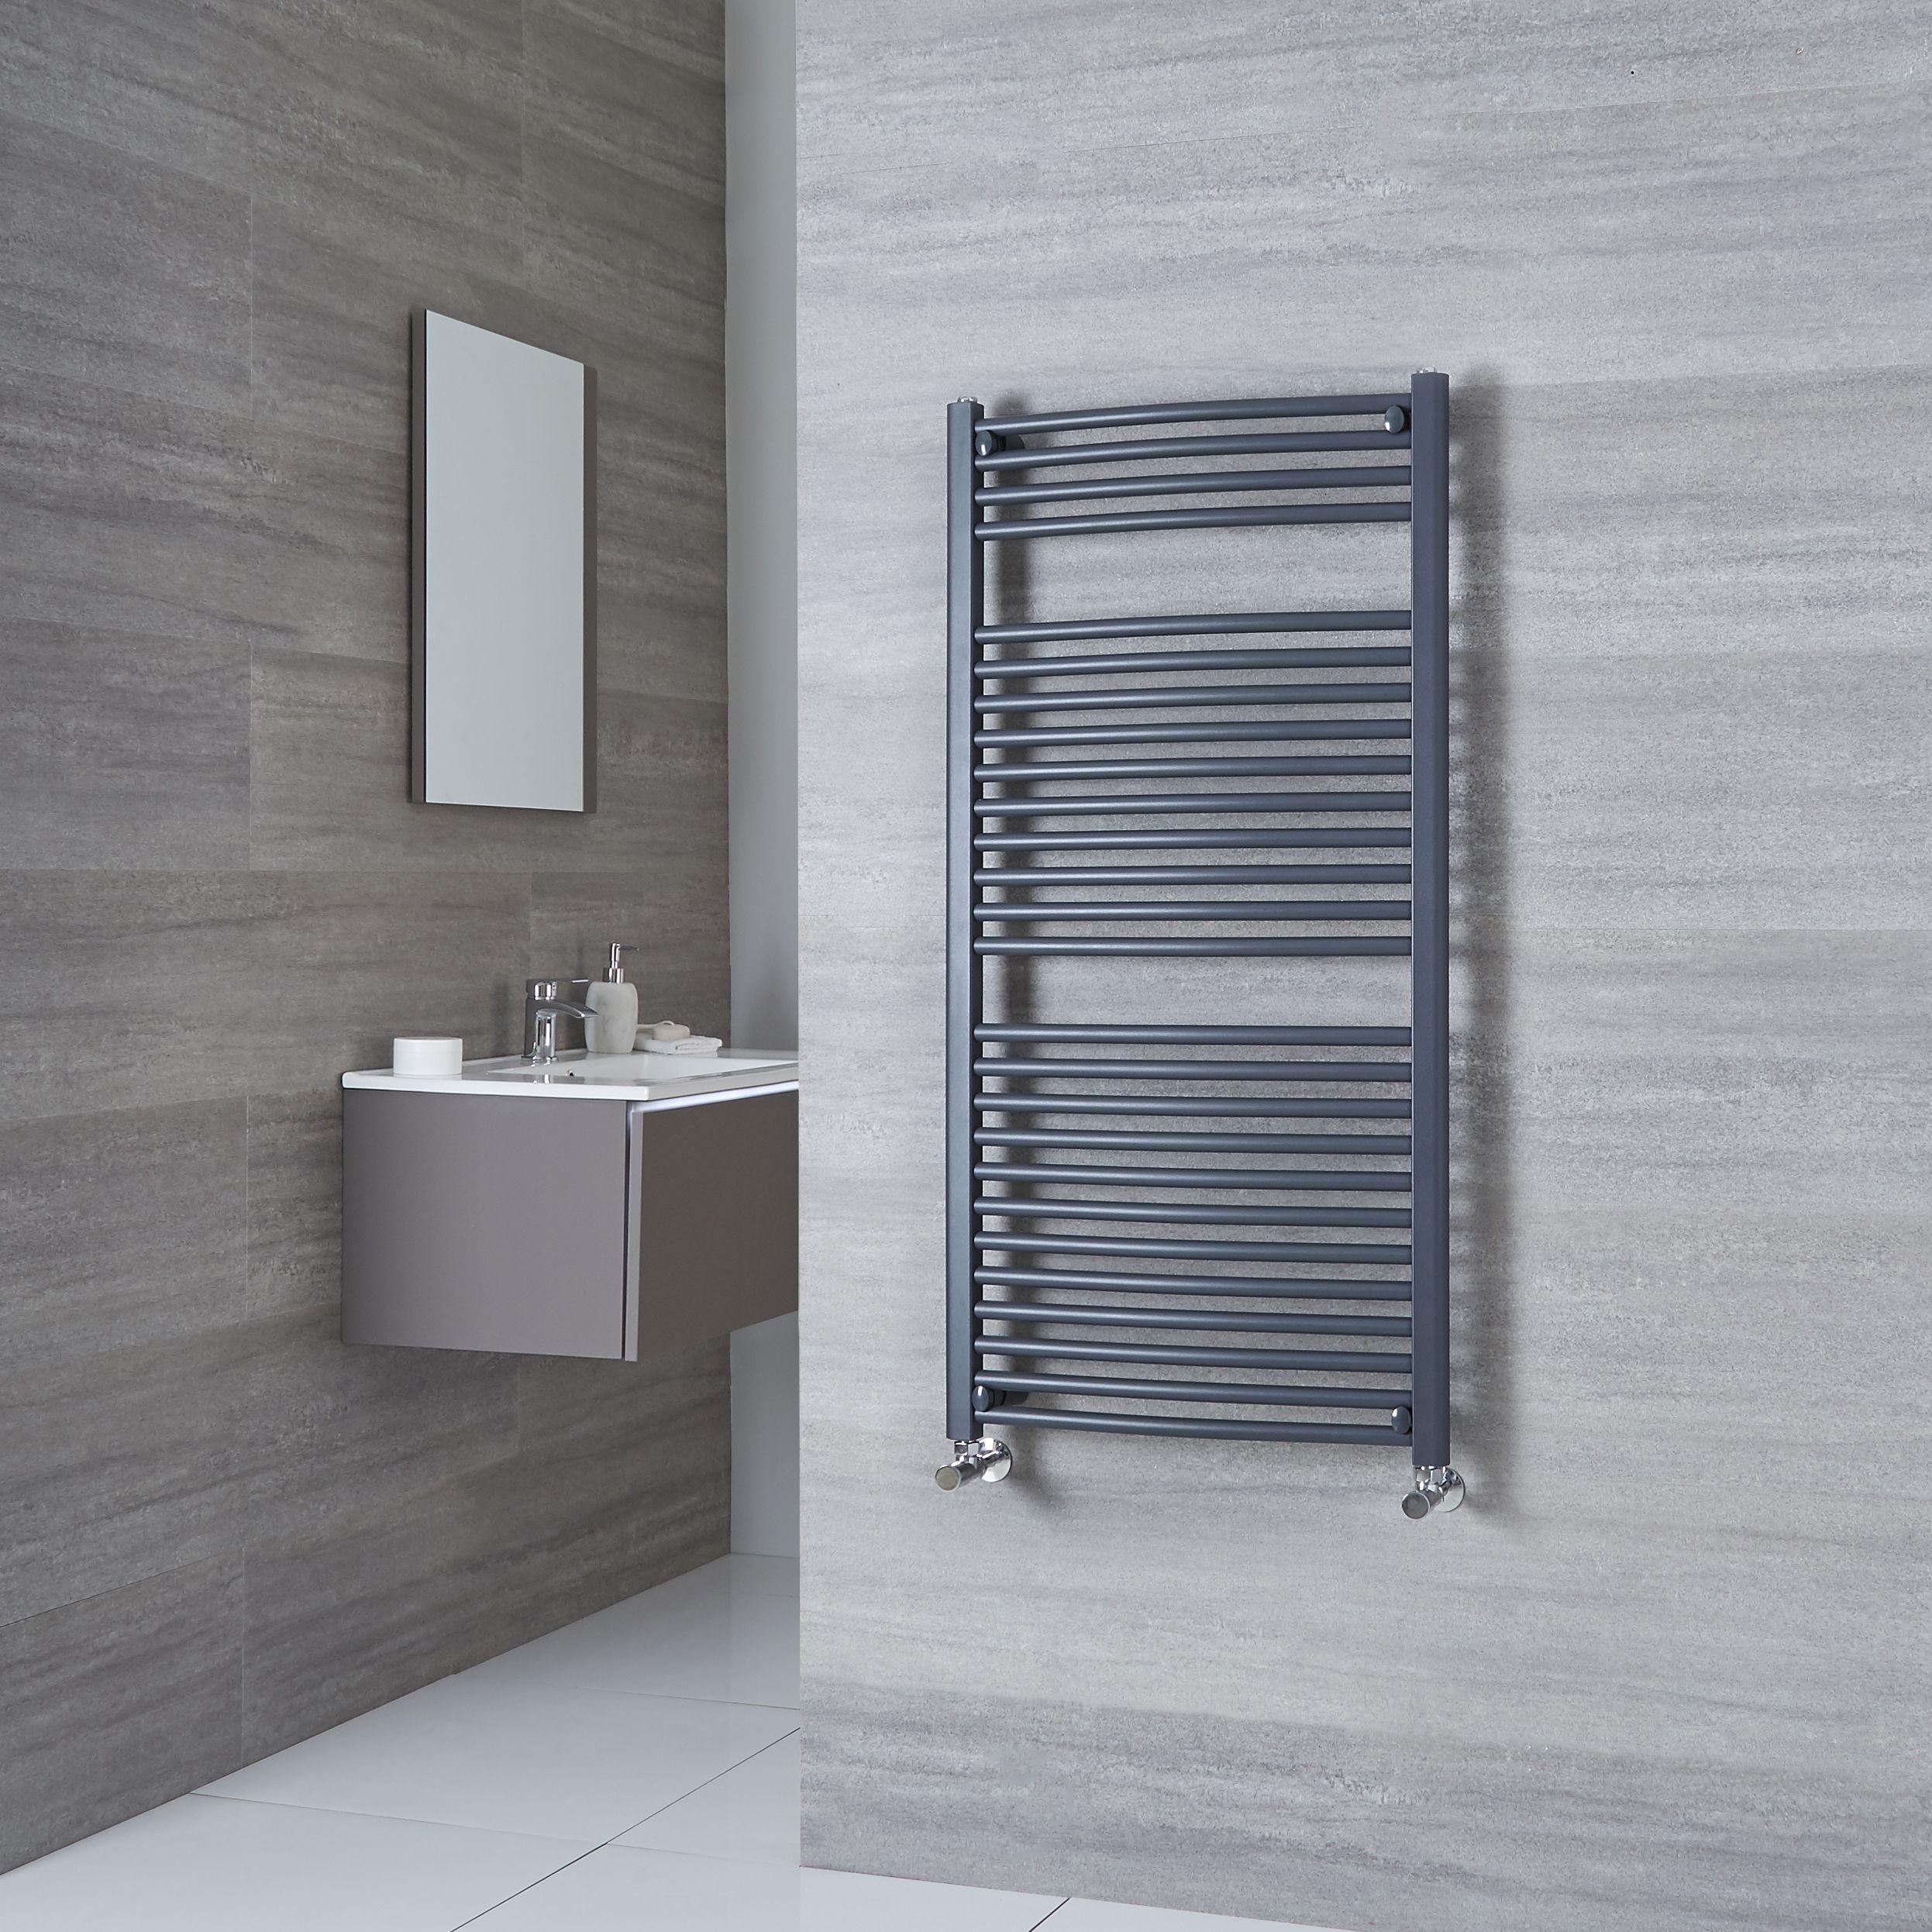 Modern Anthracite Flat Panel Heated Towel Rail Bathroom Cast Iron Style Radiator Business Office Industrial Radiators Towel Rails Pavanelloprojetos Com Br